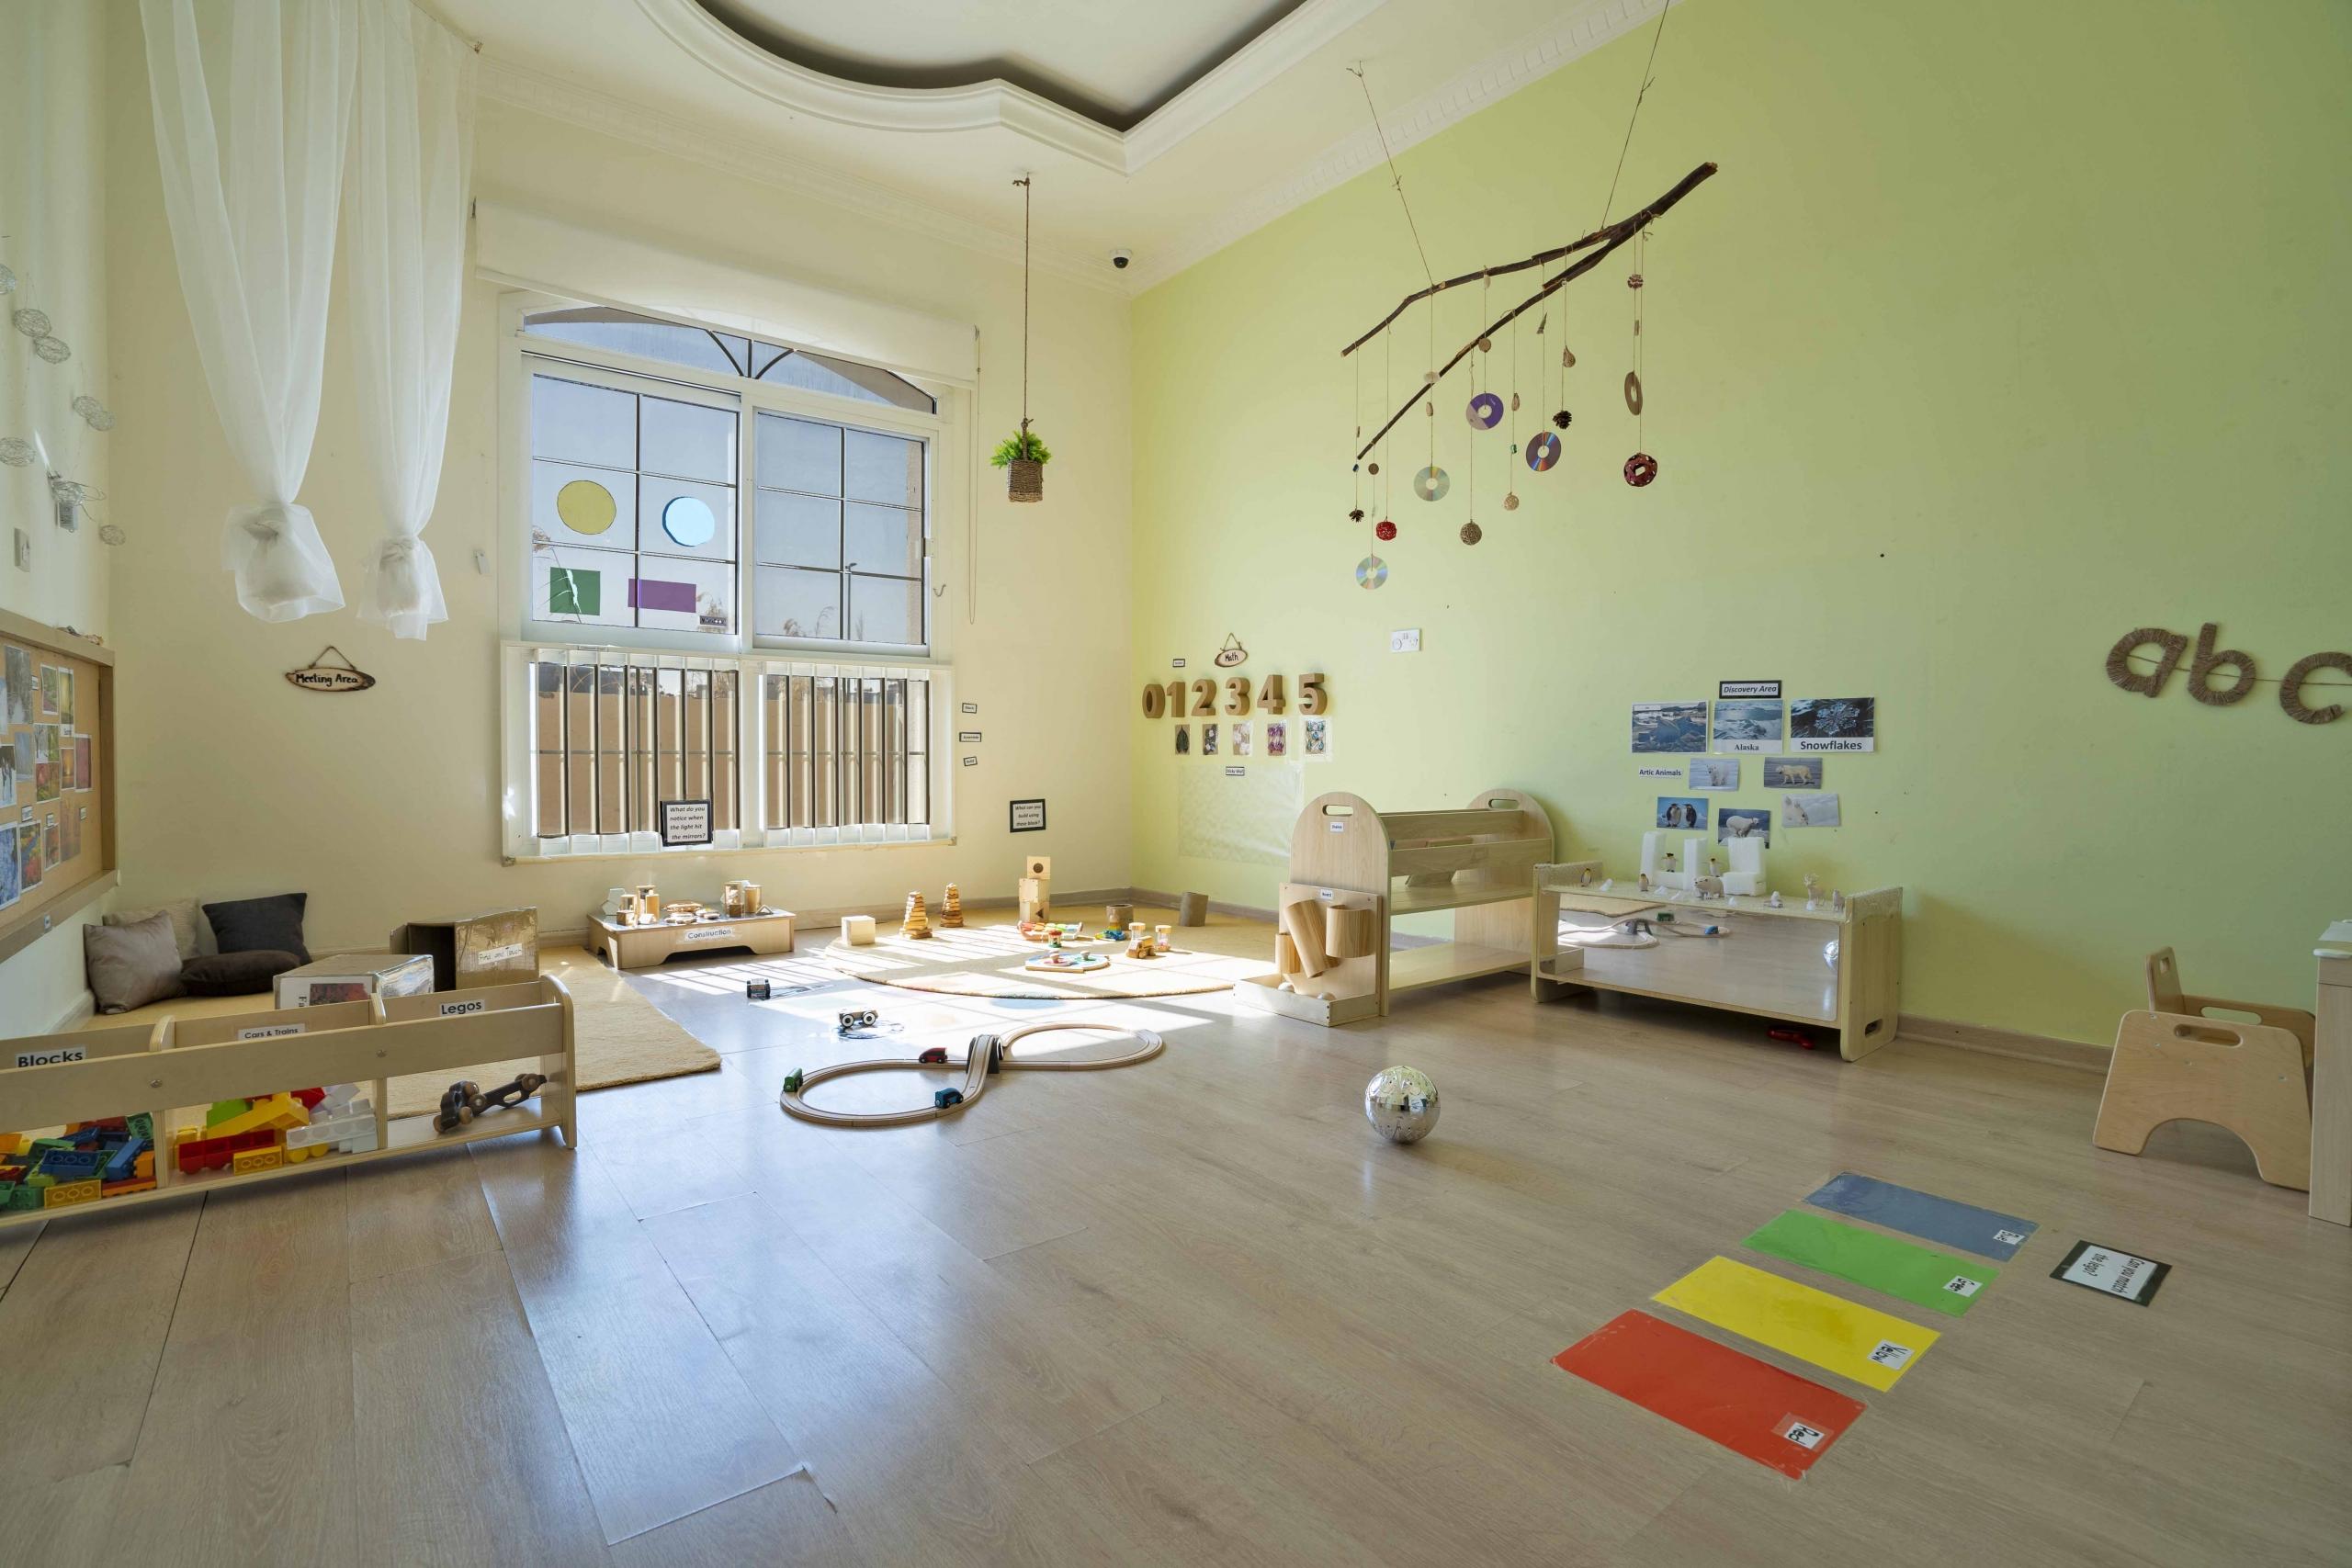 Khalifa classroom 8